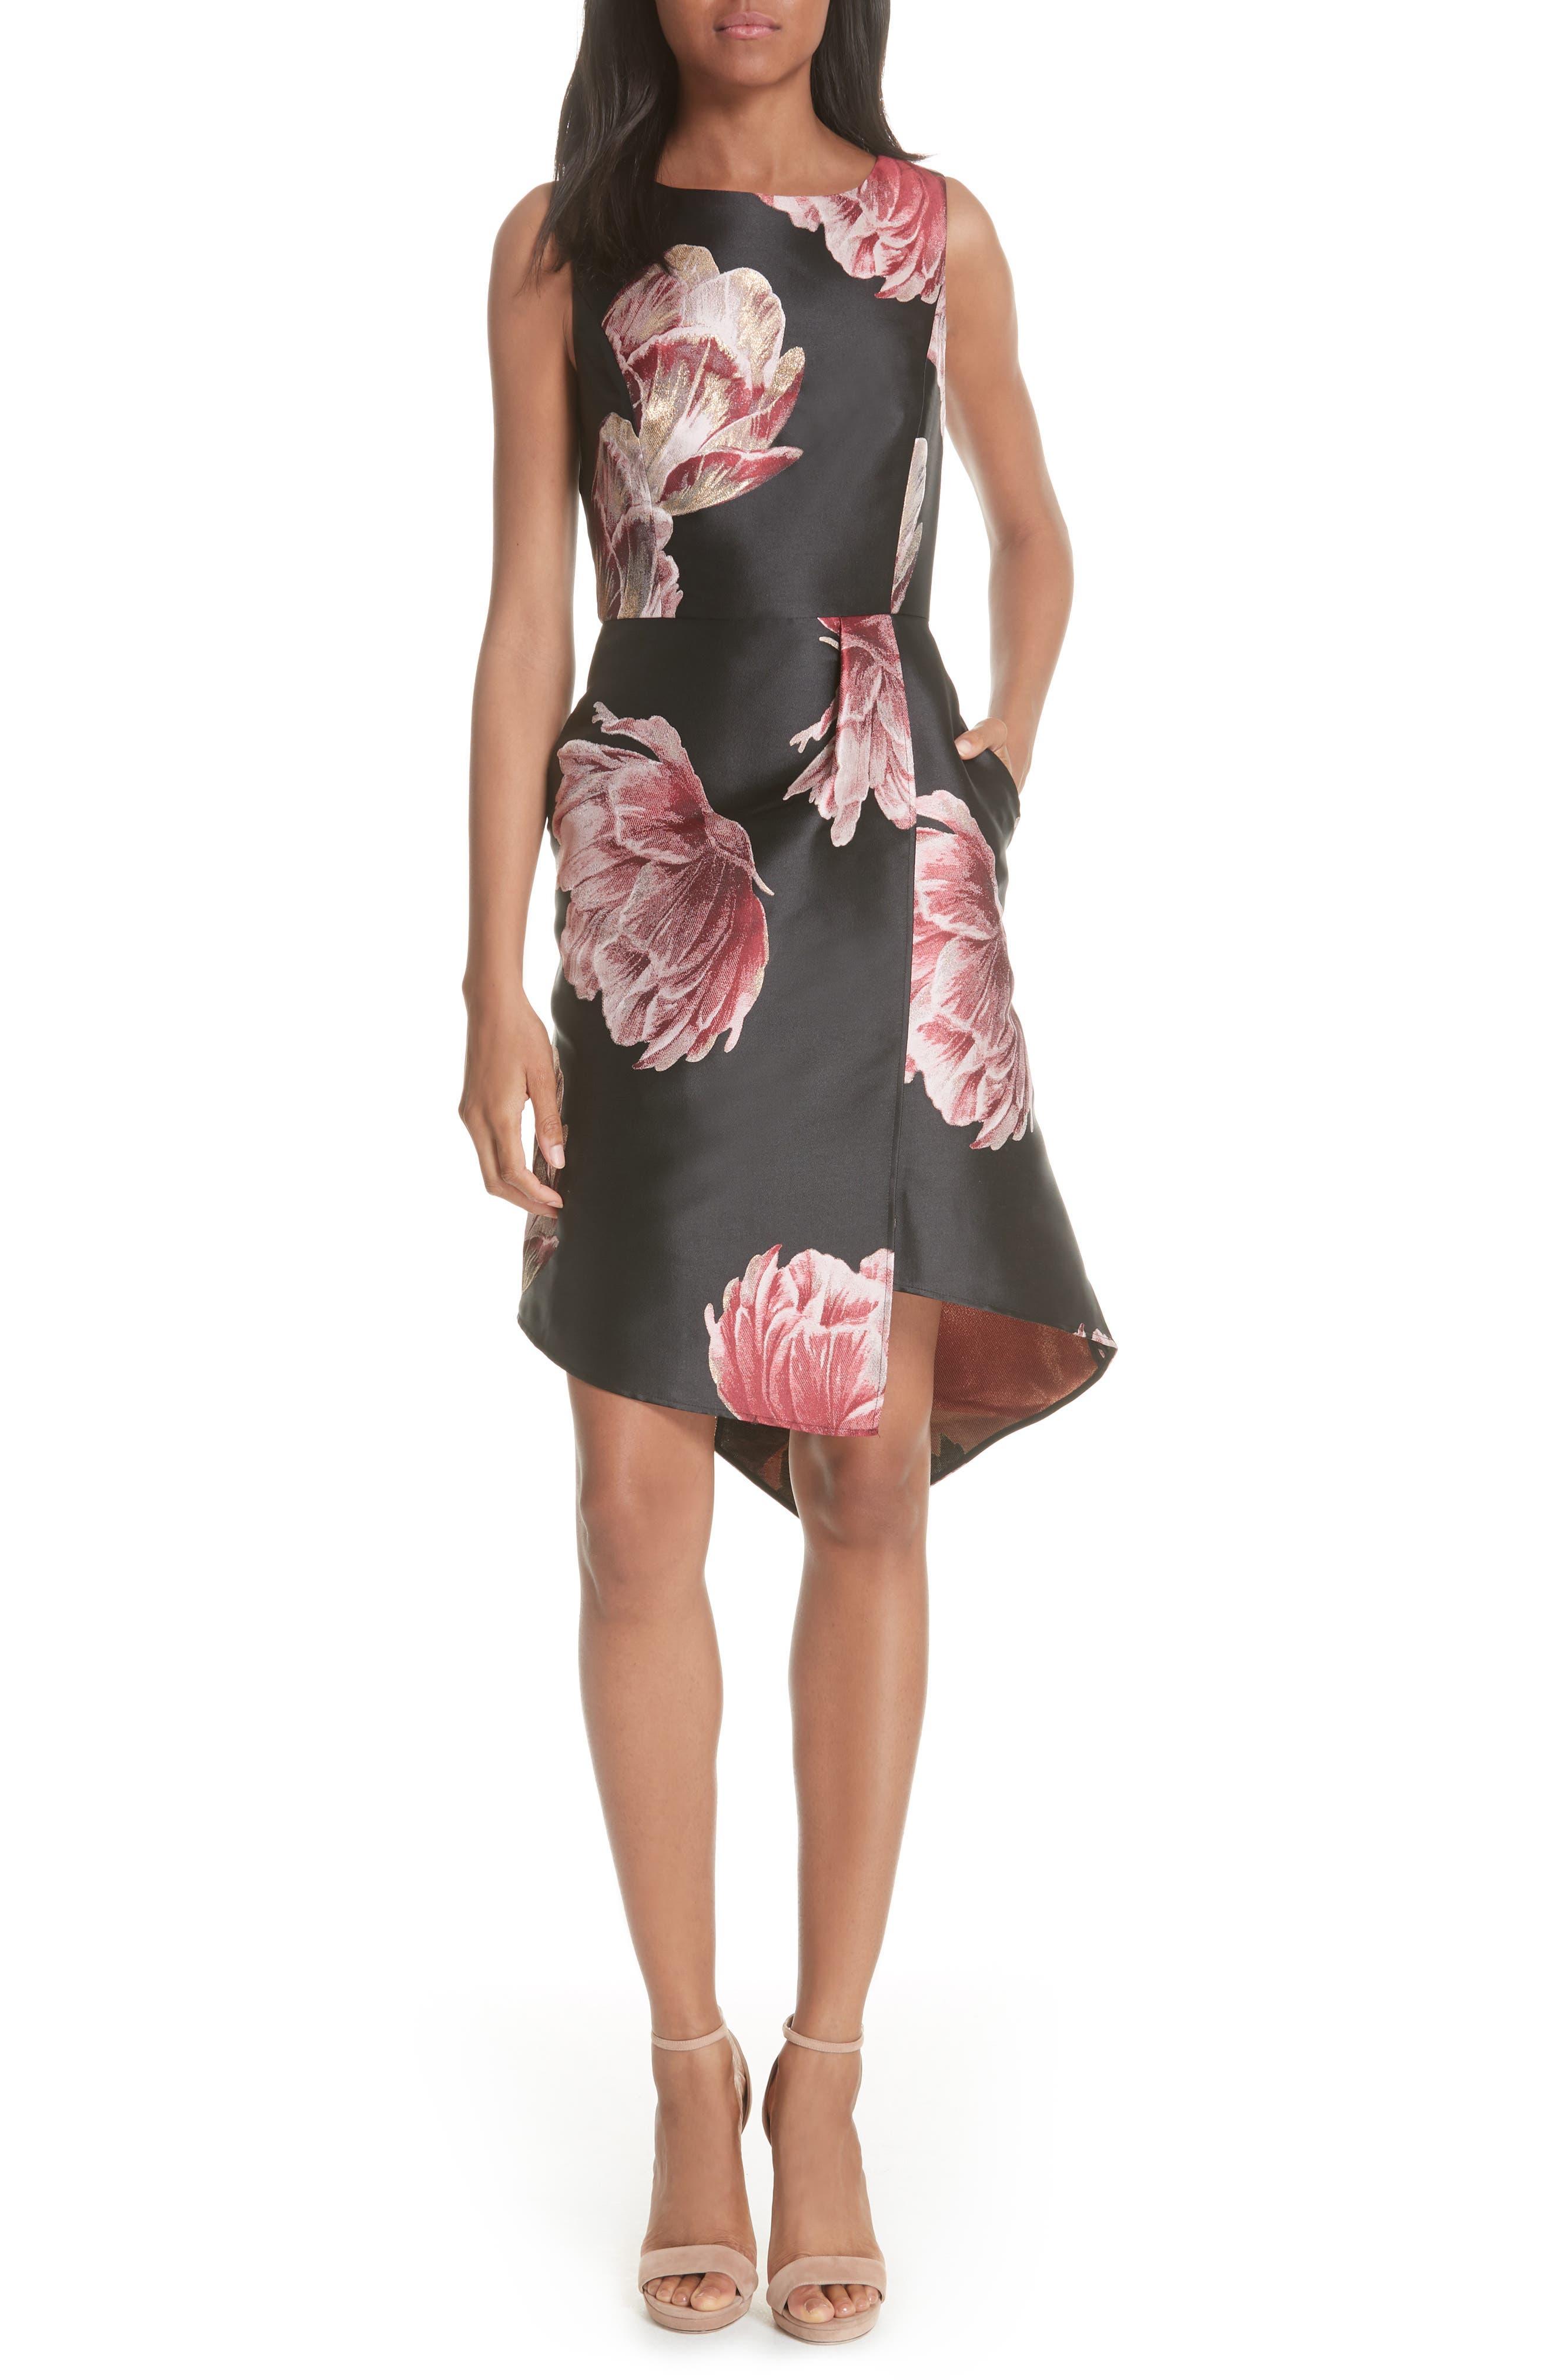 Eyvii Bay of Honour Asymmetrical Dress,                             Main thumbnail 1, color,                             001